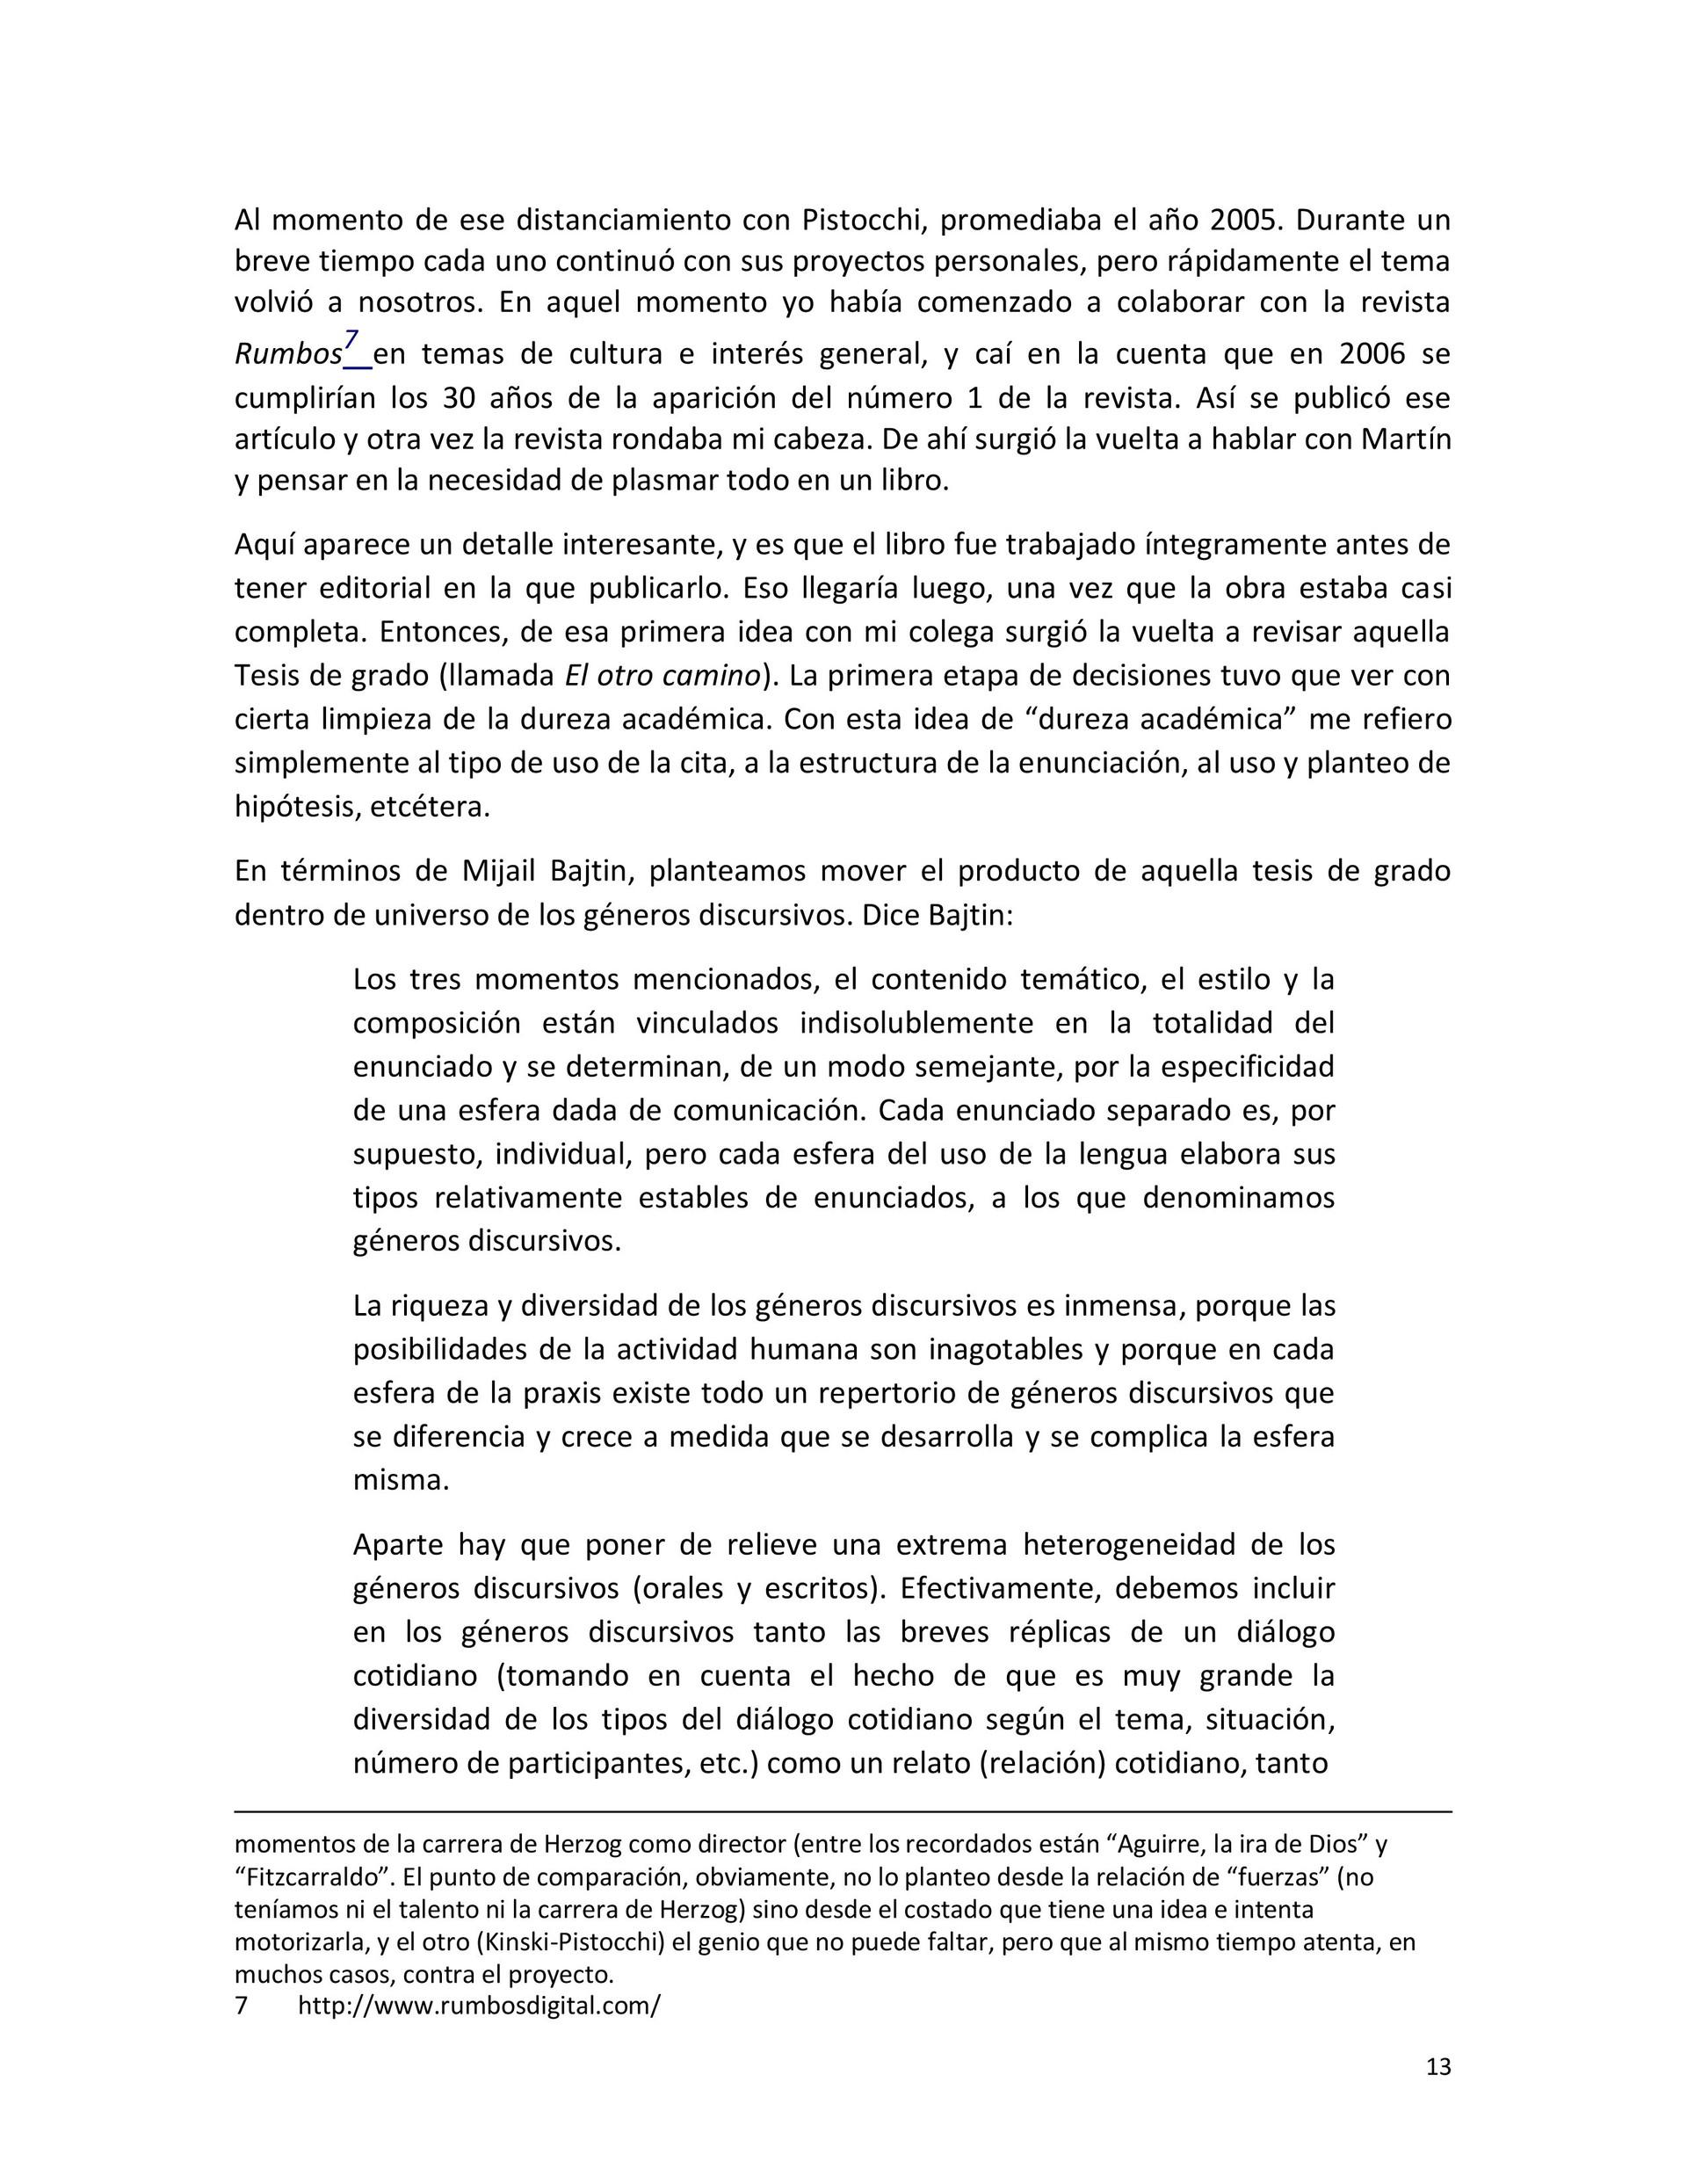 estacion_Page_12.jpeg